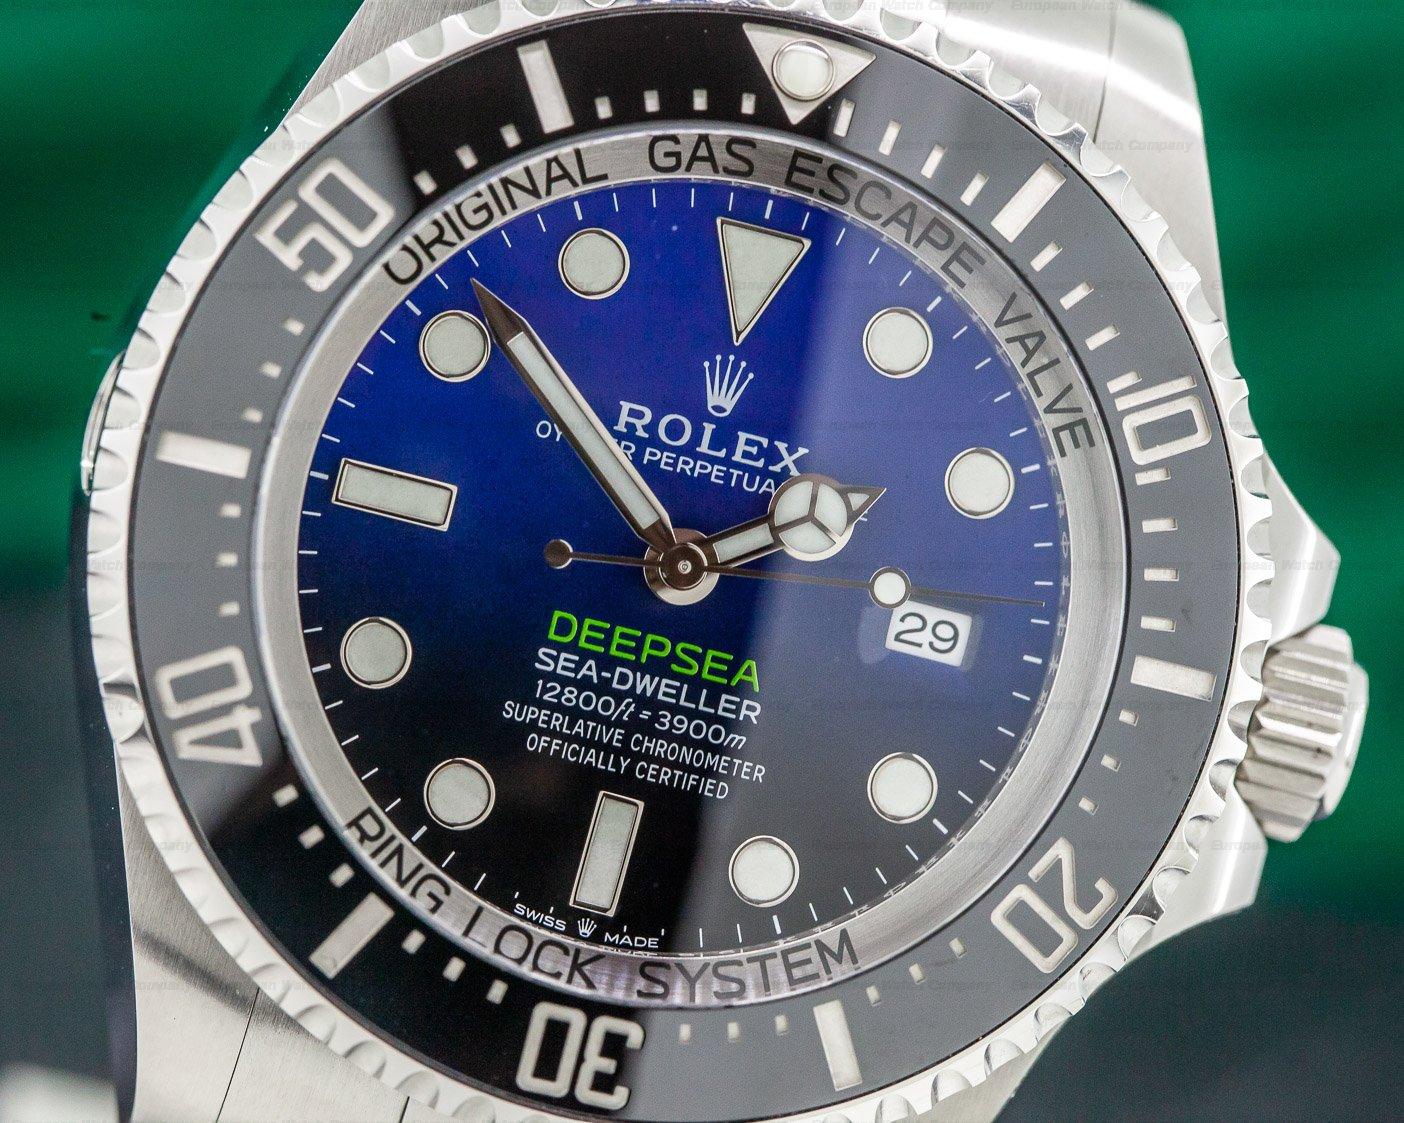 Rolex 126660 Sea Dweller Deep Sea D-Blue 2018 Model